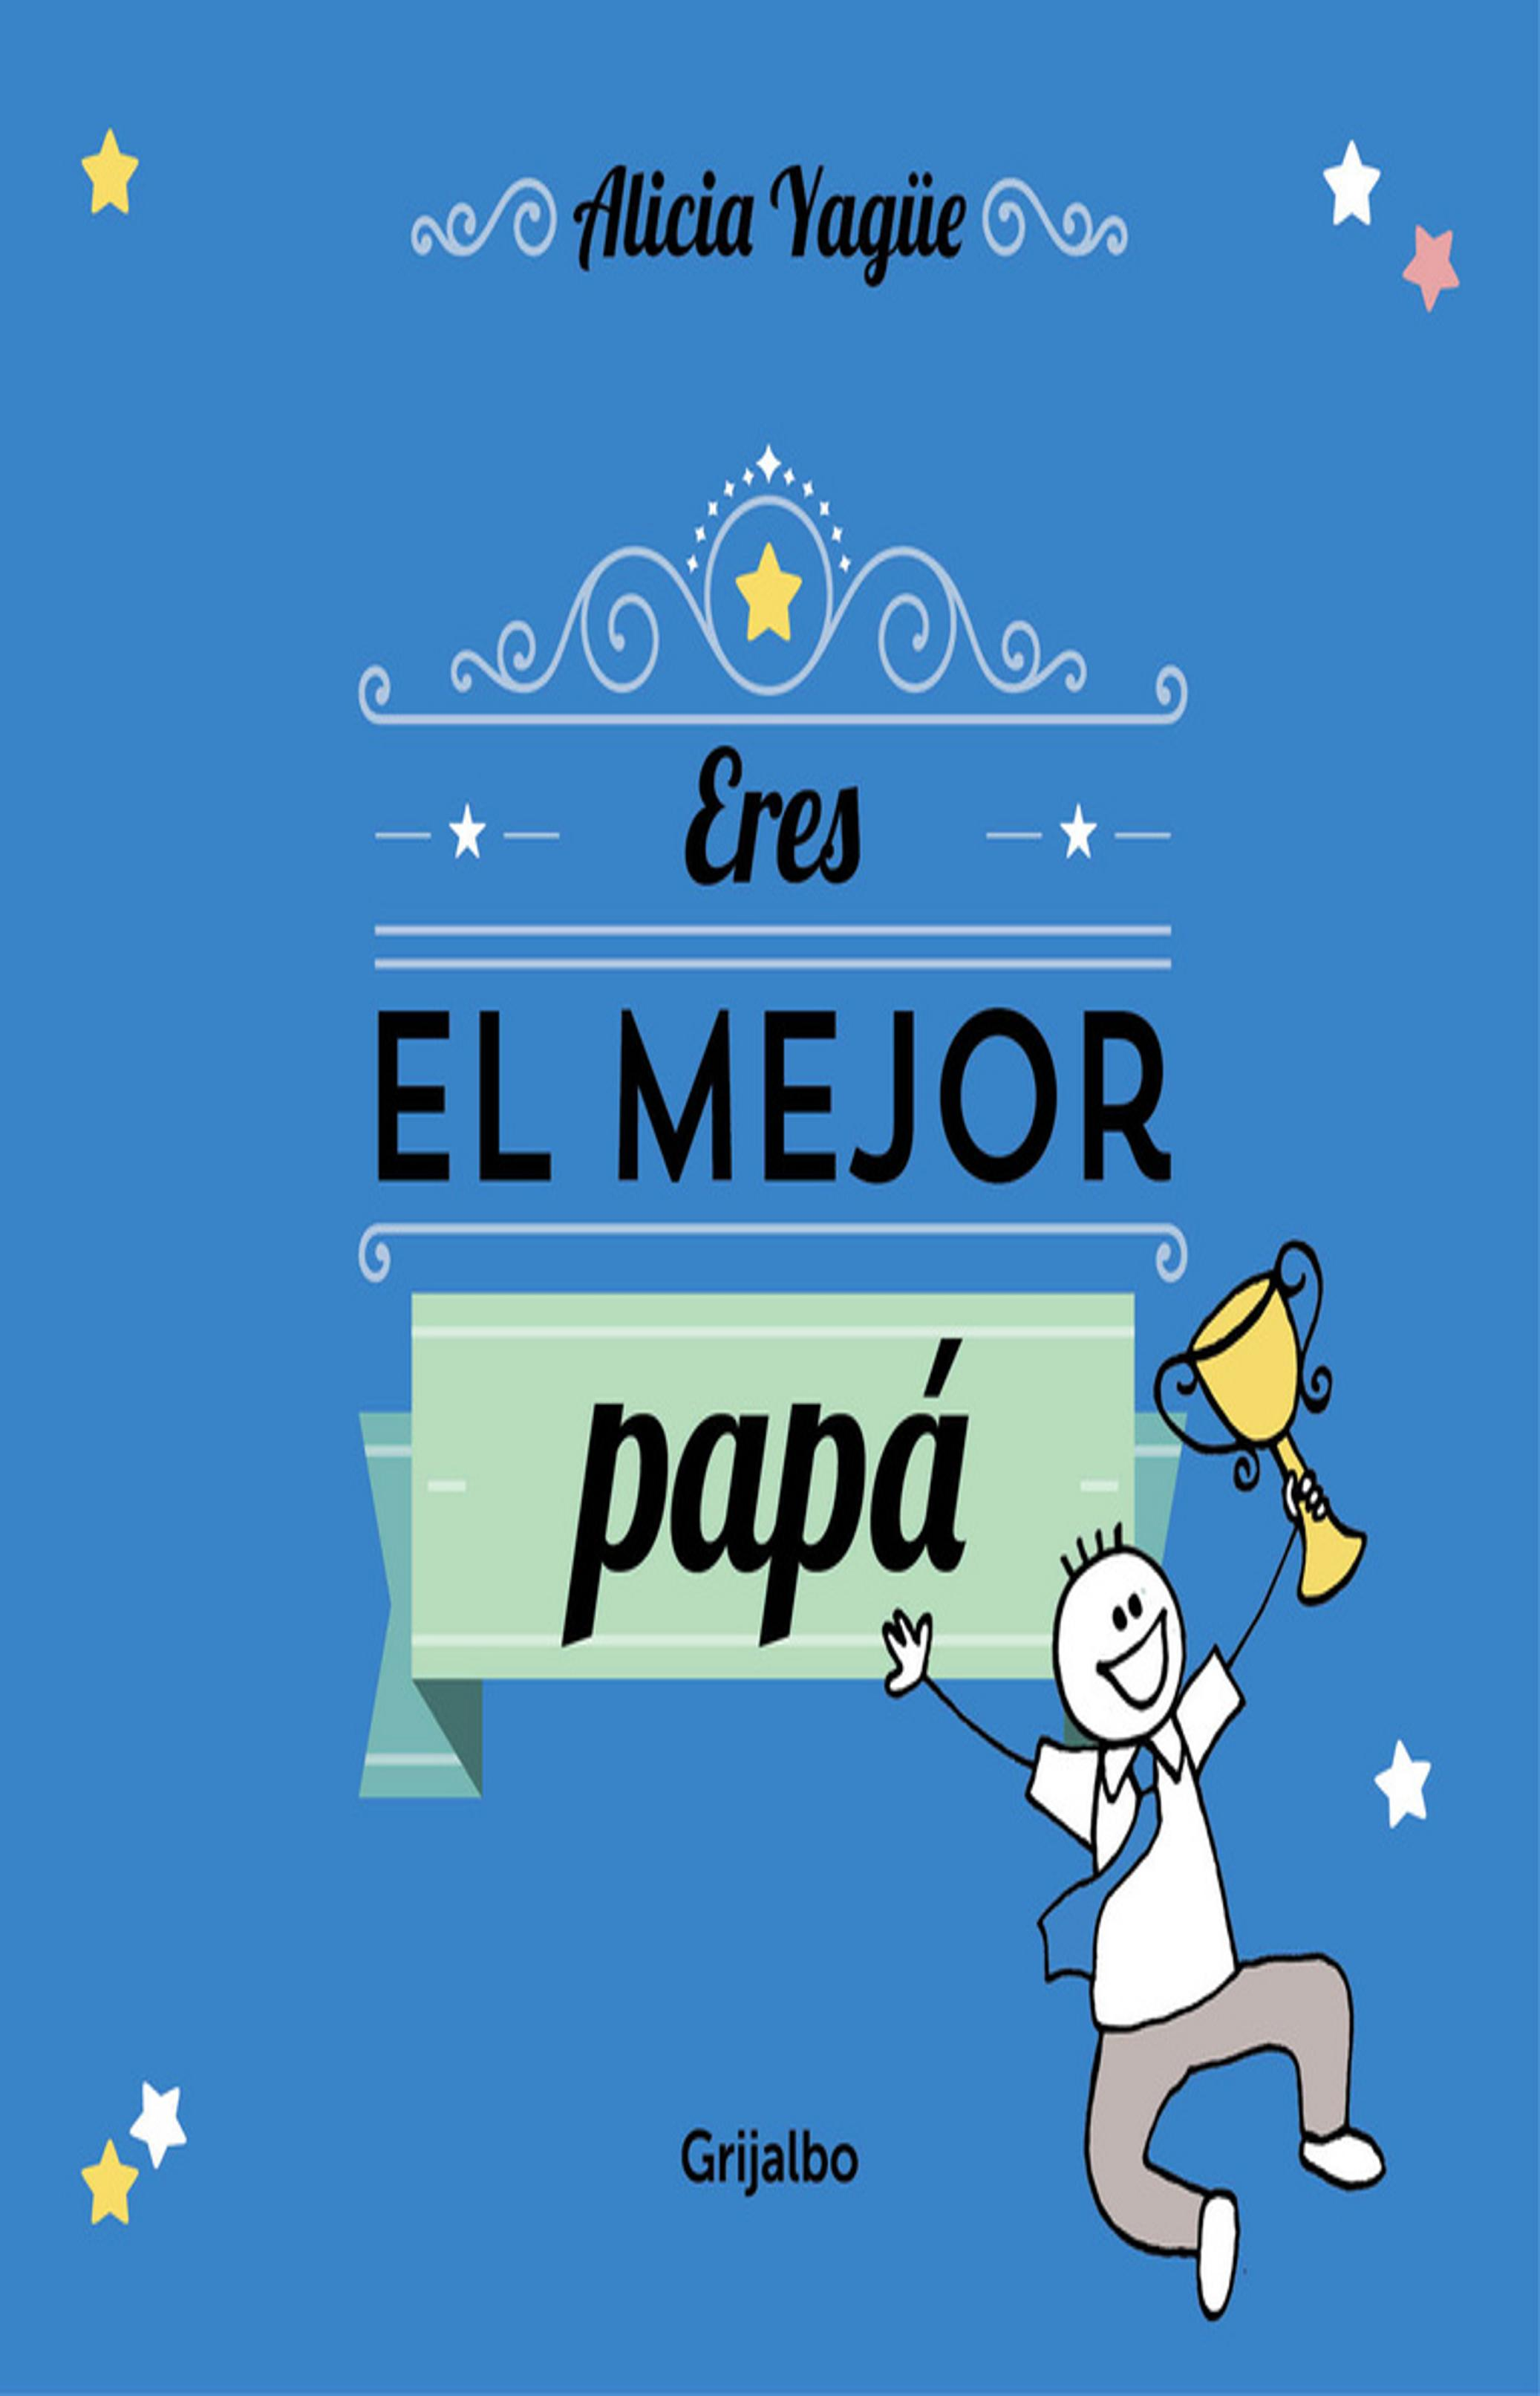 ERES EL MEJOR PAPÁ